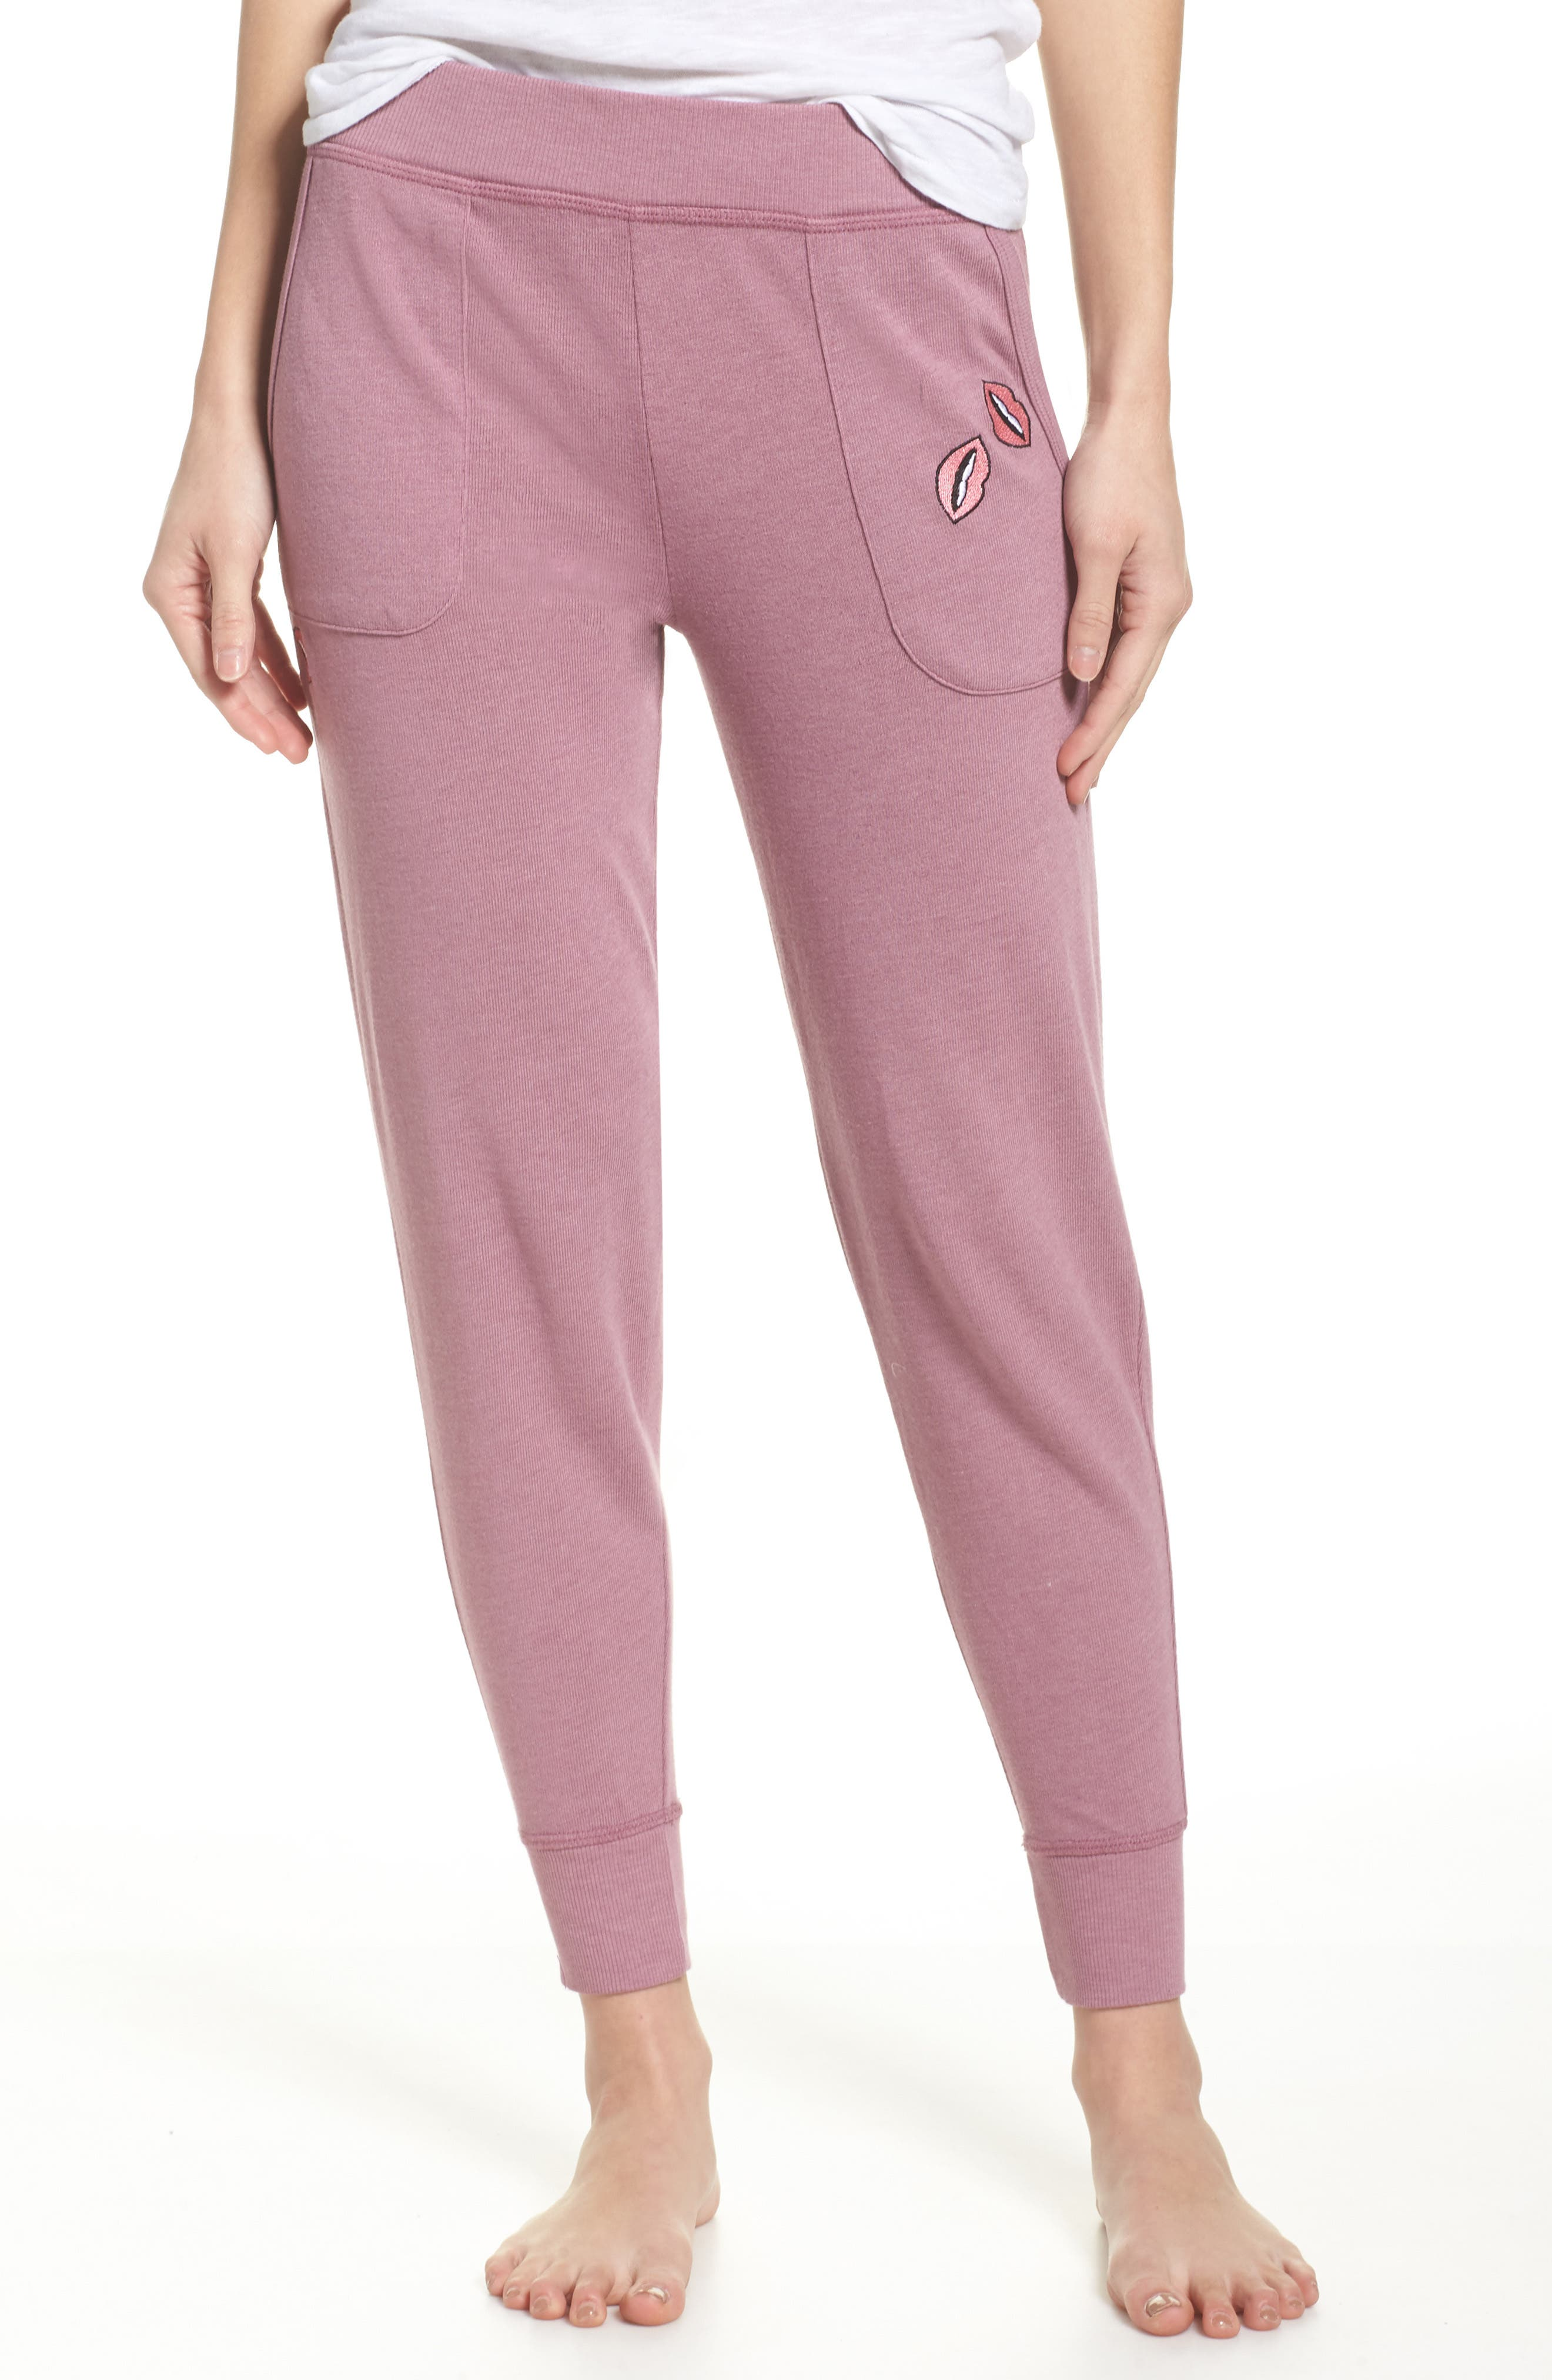 Junkfood Girl Talk Jogger Pants,                         Main,                         color, Dawn